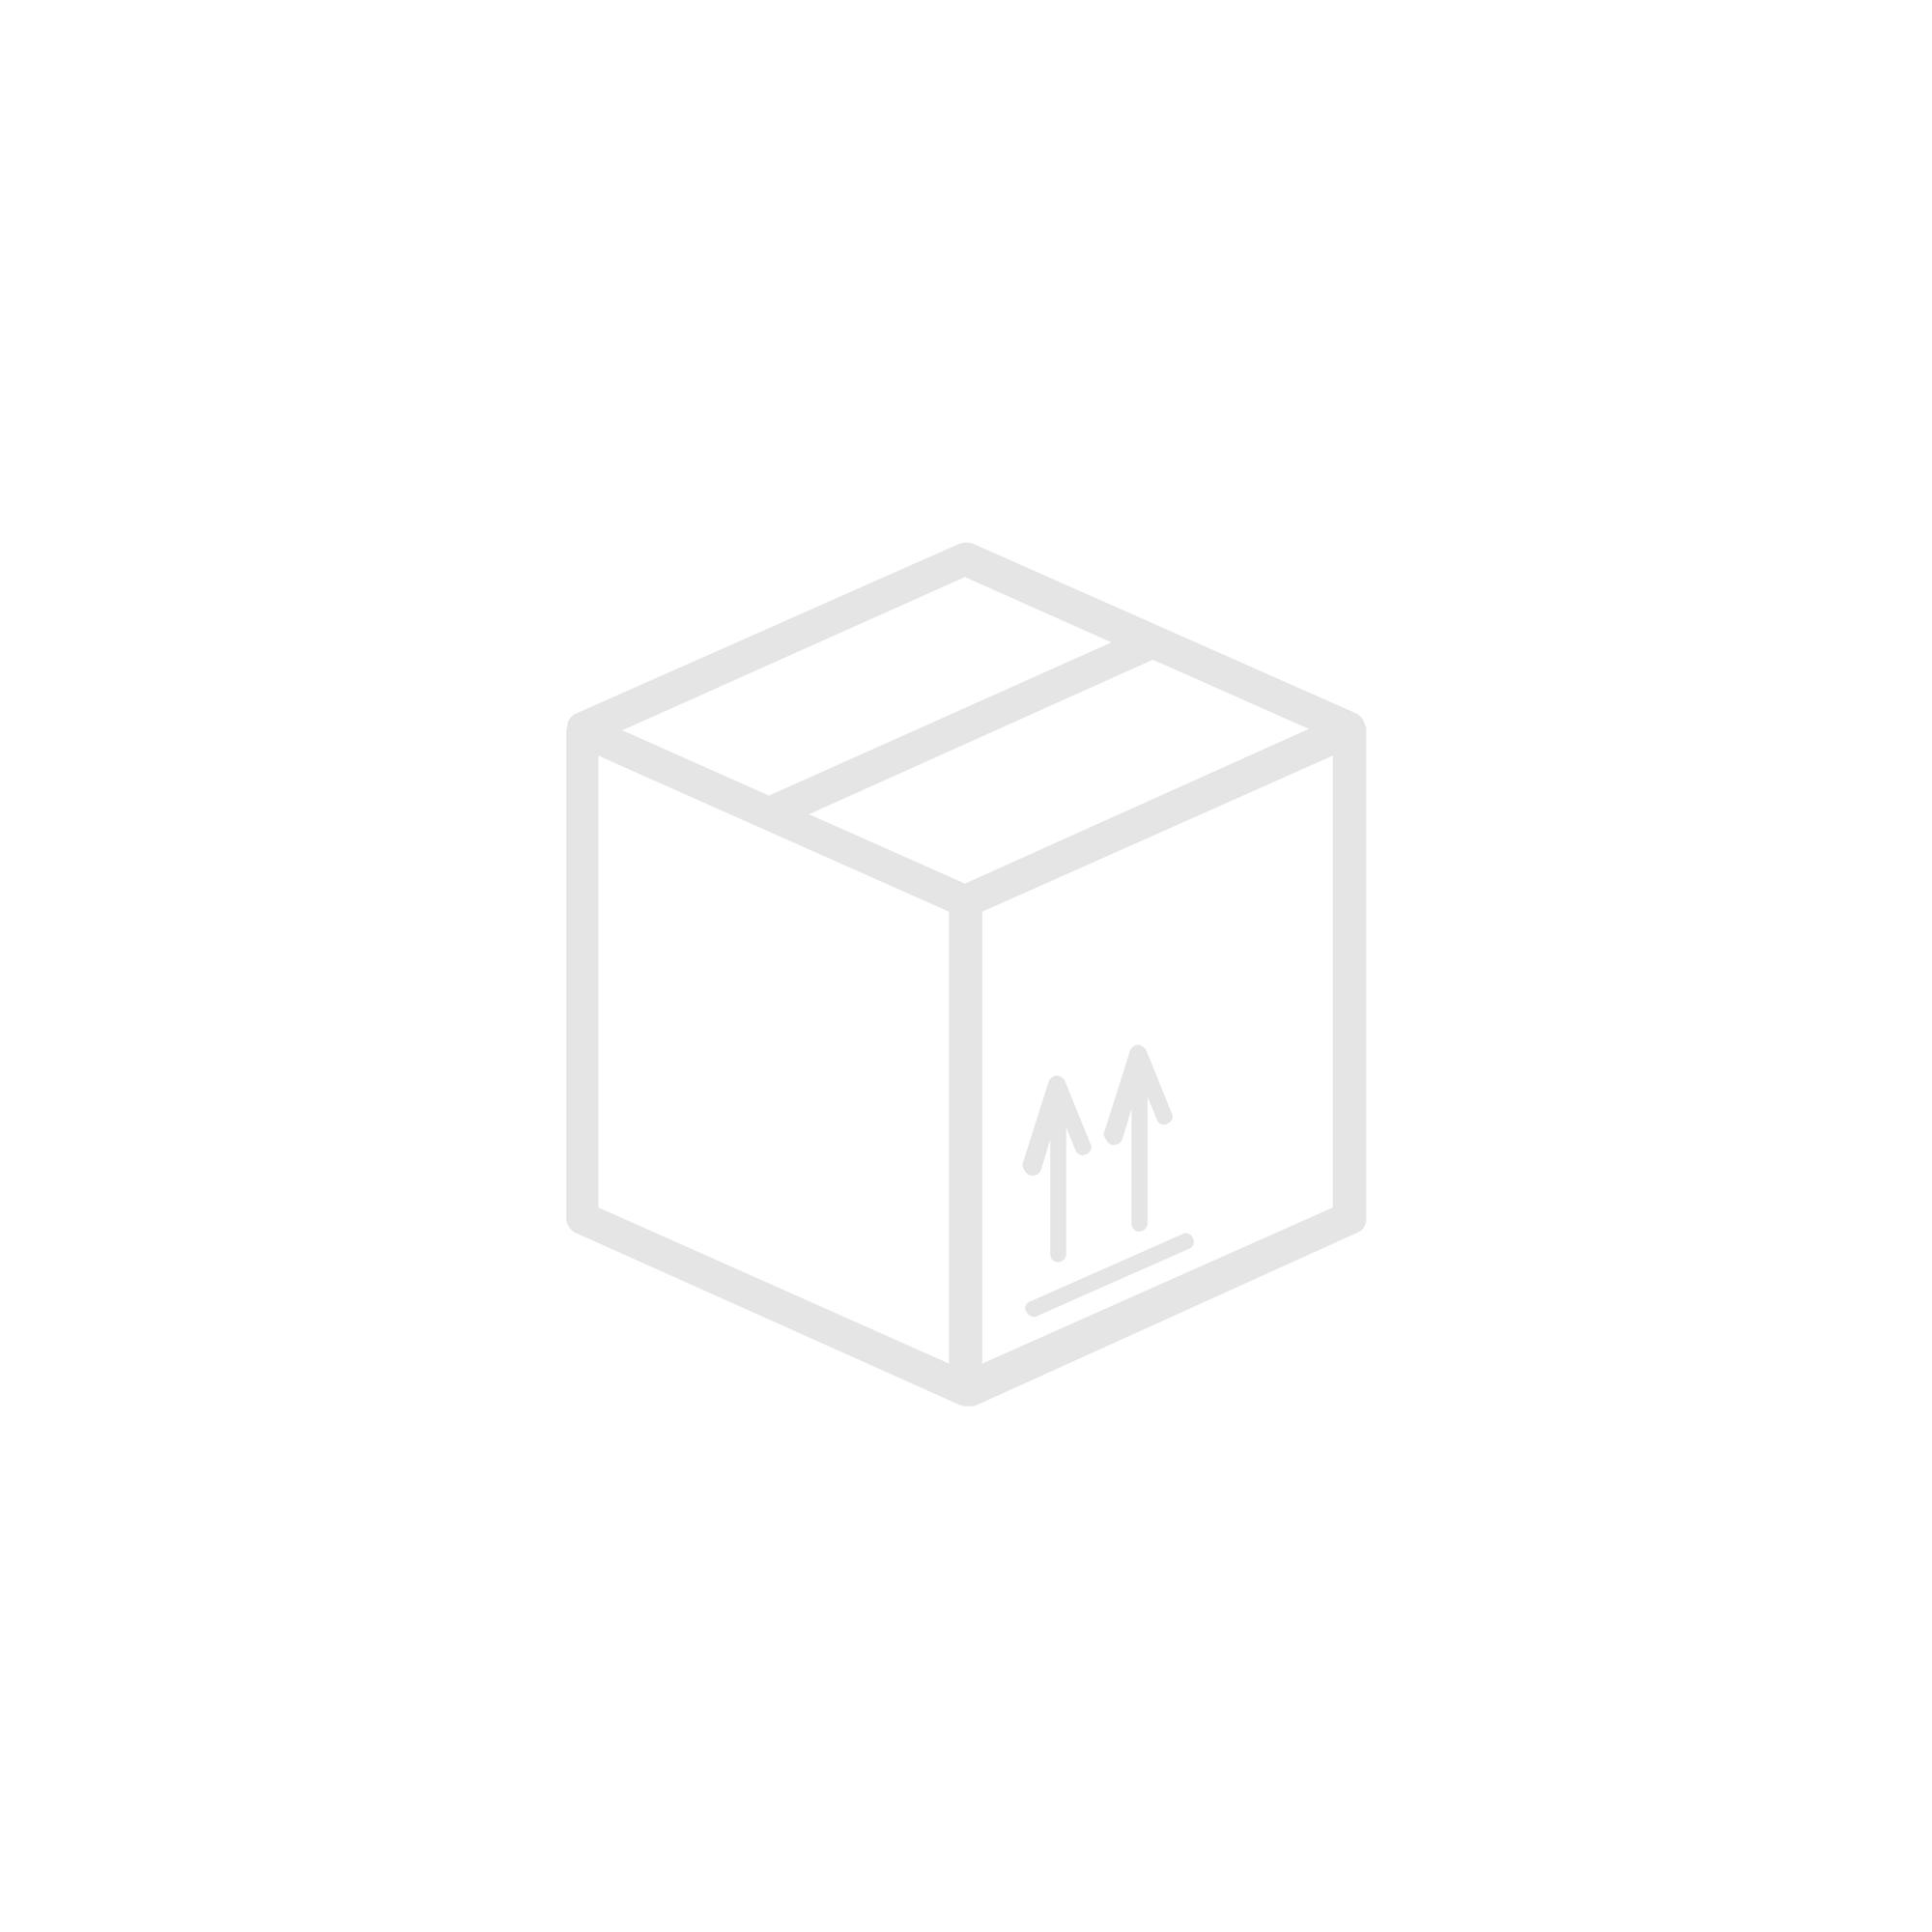 KANLUX Ventilátor VENETO 40B stojací